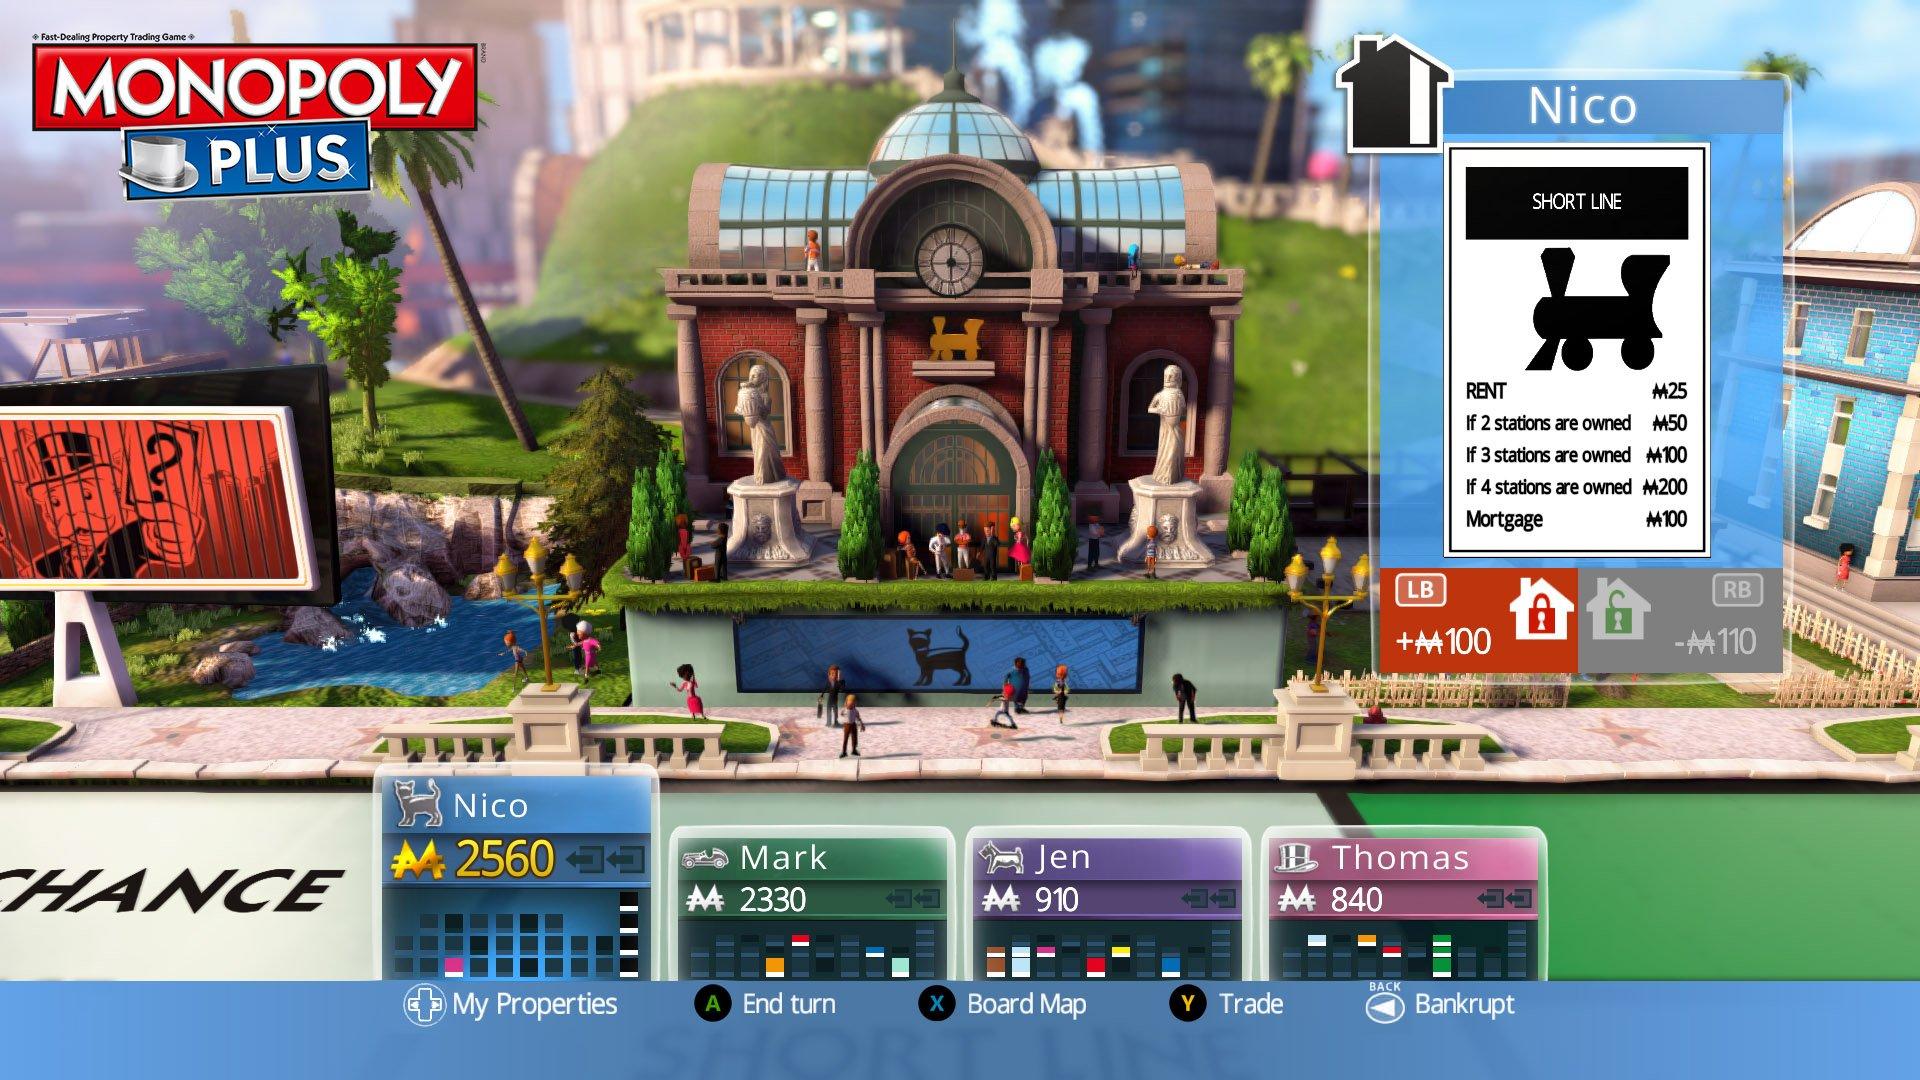 monopoly_plus-2590438.jpg